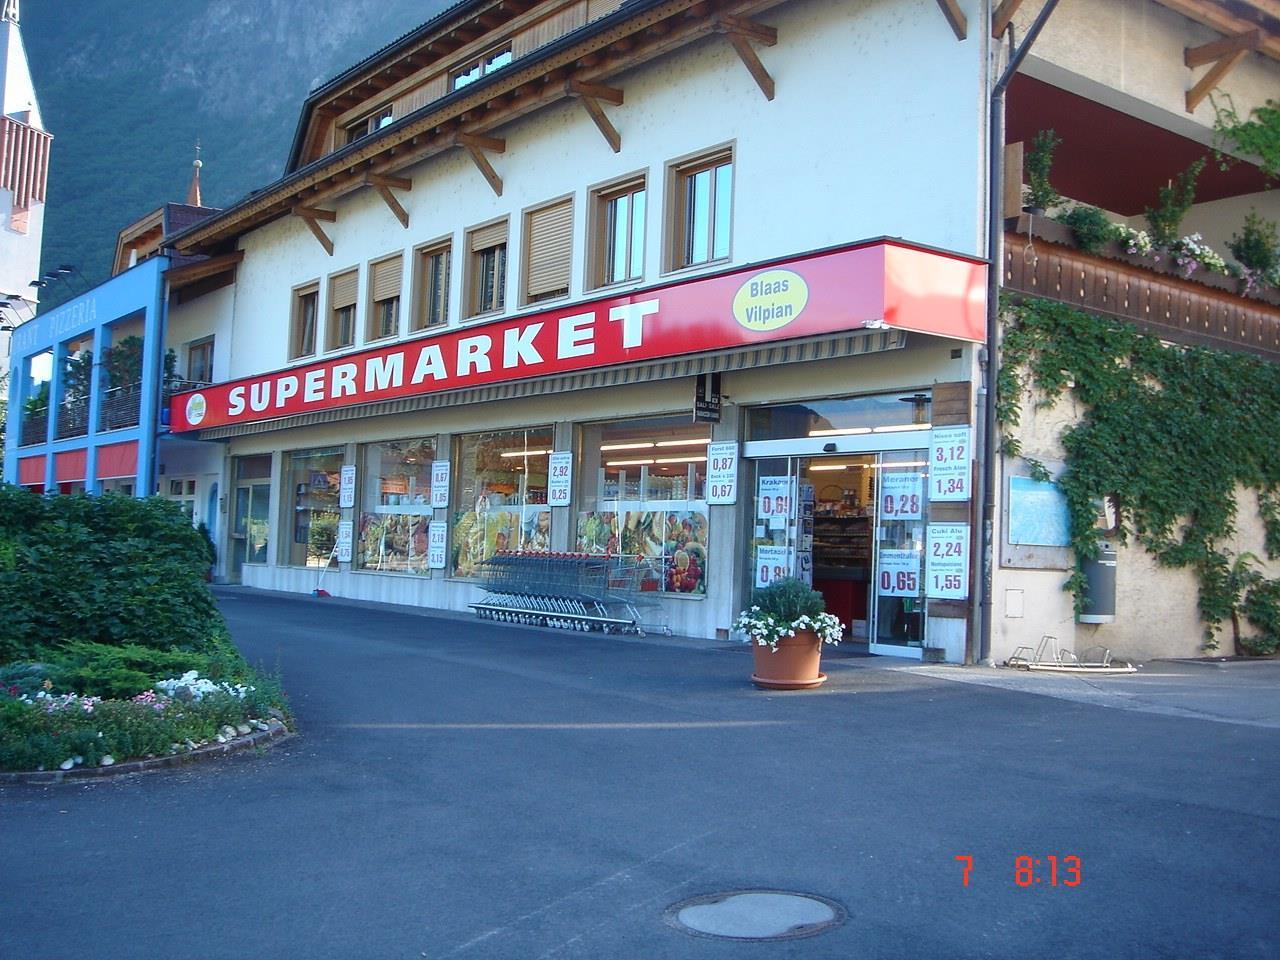 Market - Food shop Blaas